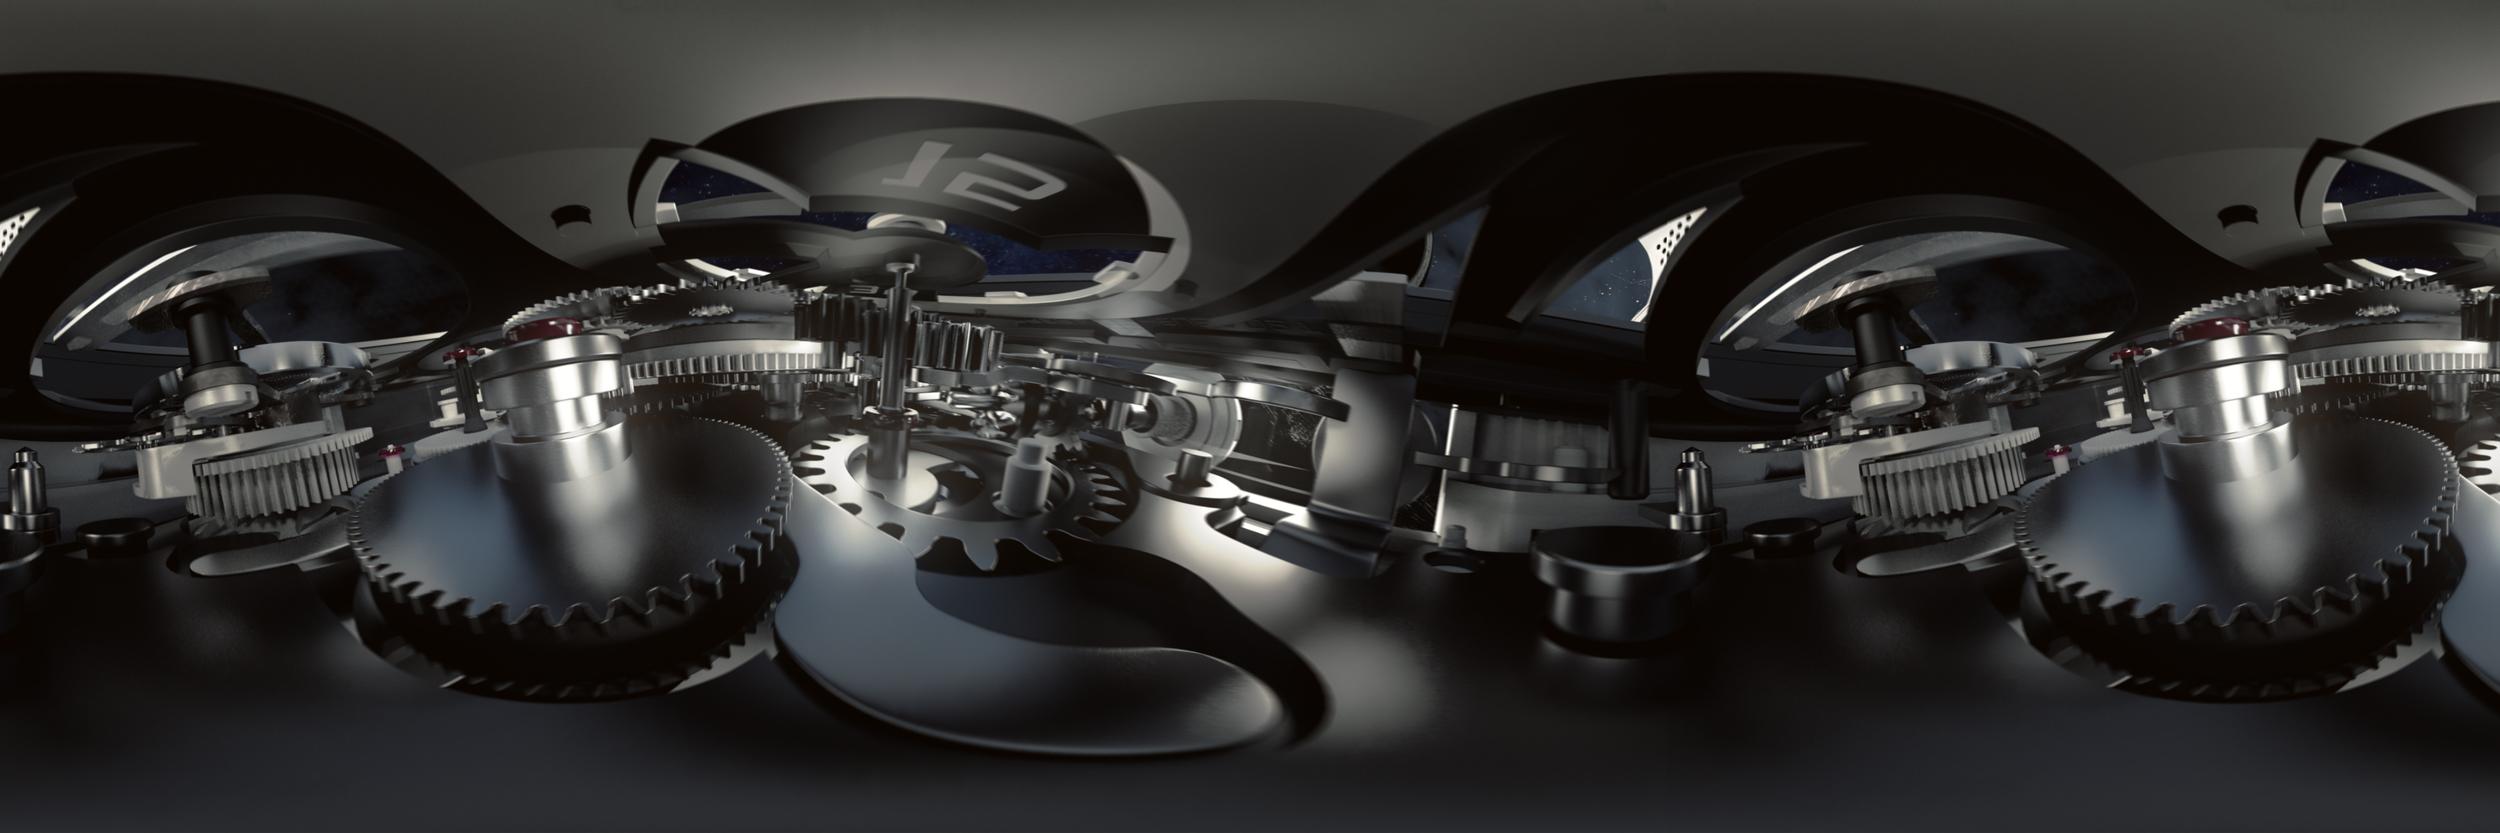 TH_VR-Panorama (07058).jpg